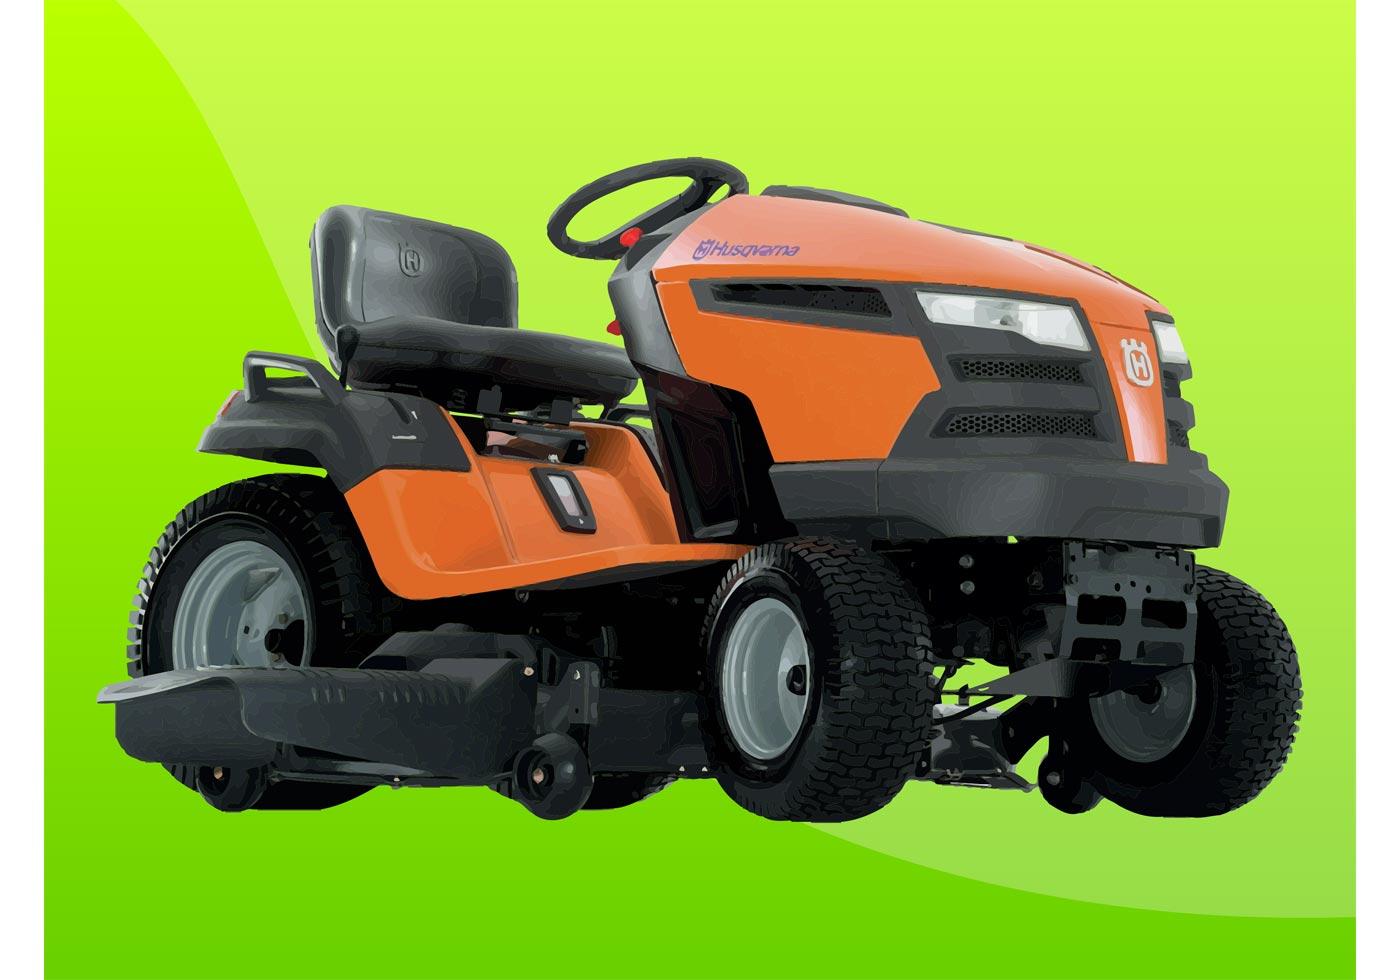 lawn mower free vector art